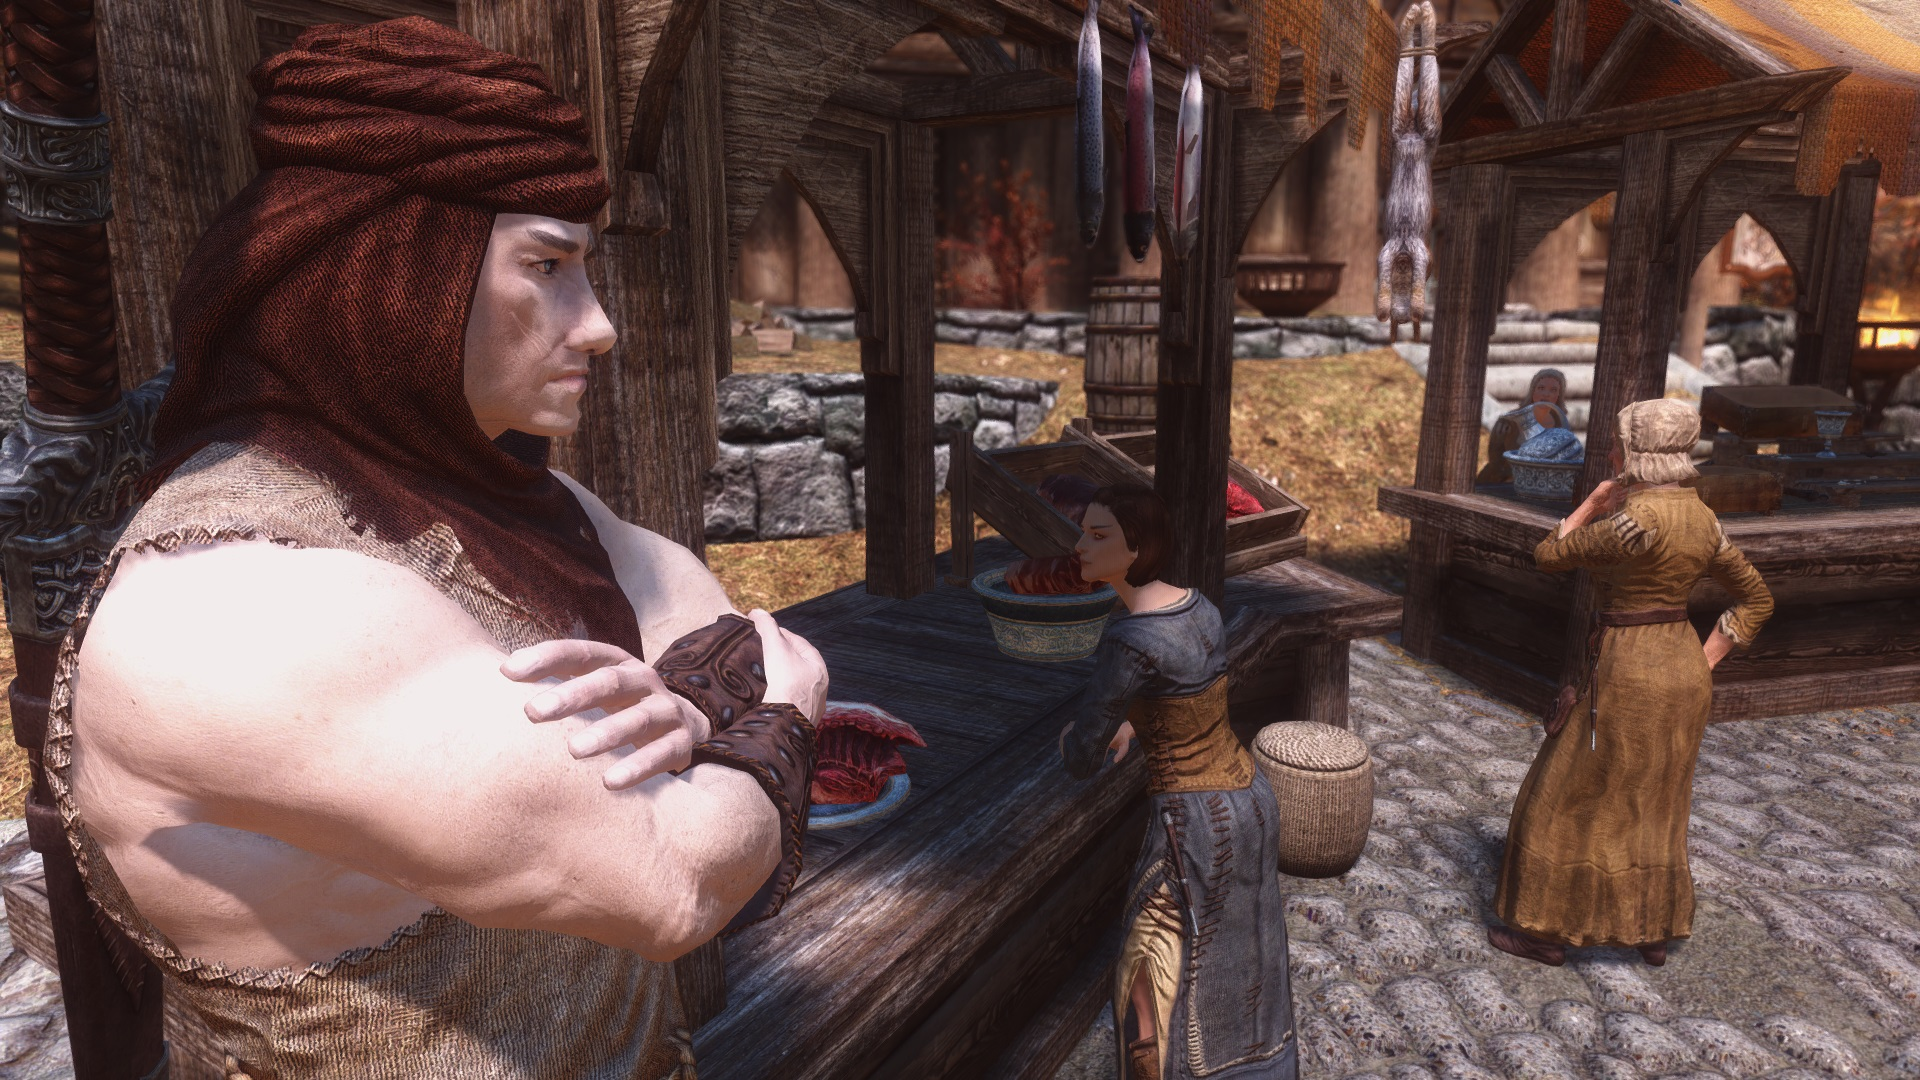 Kosh - The Elder Scrolls 5: Skyrim